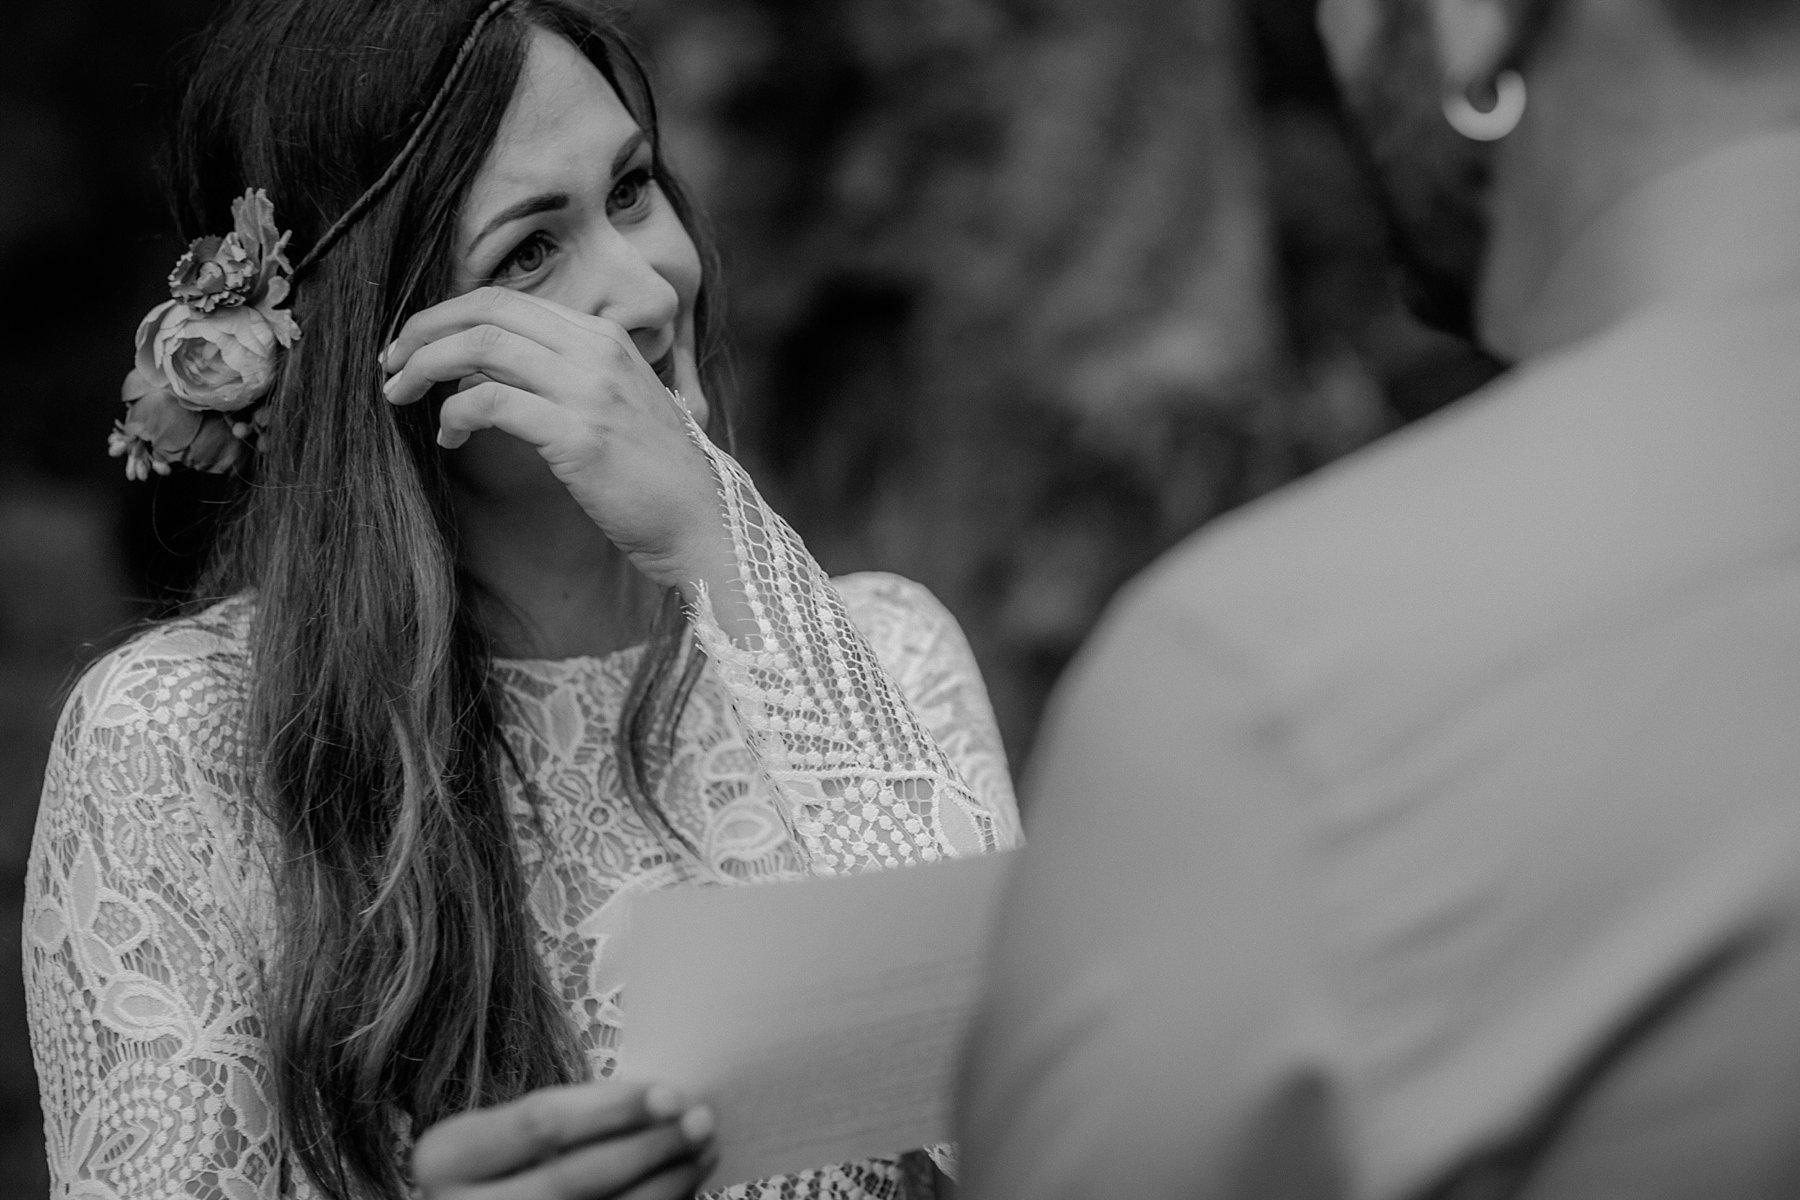 A bride cries at her elopement wedding.